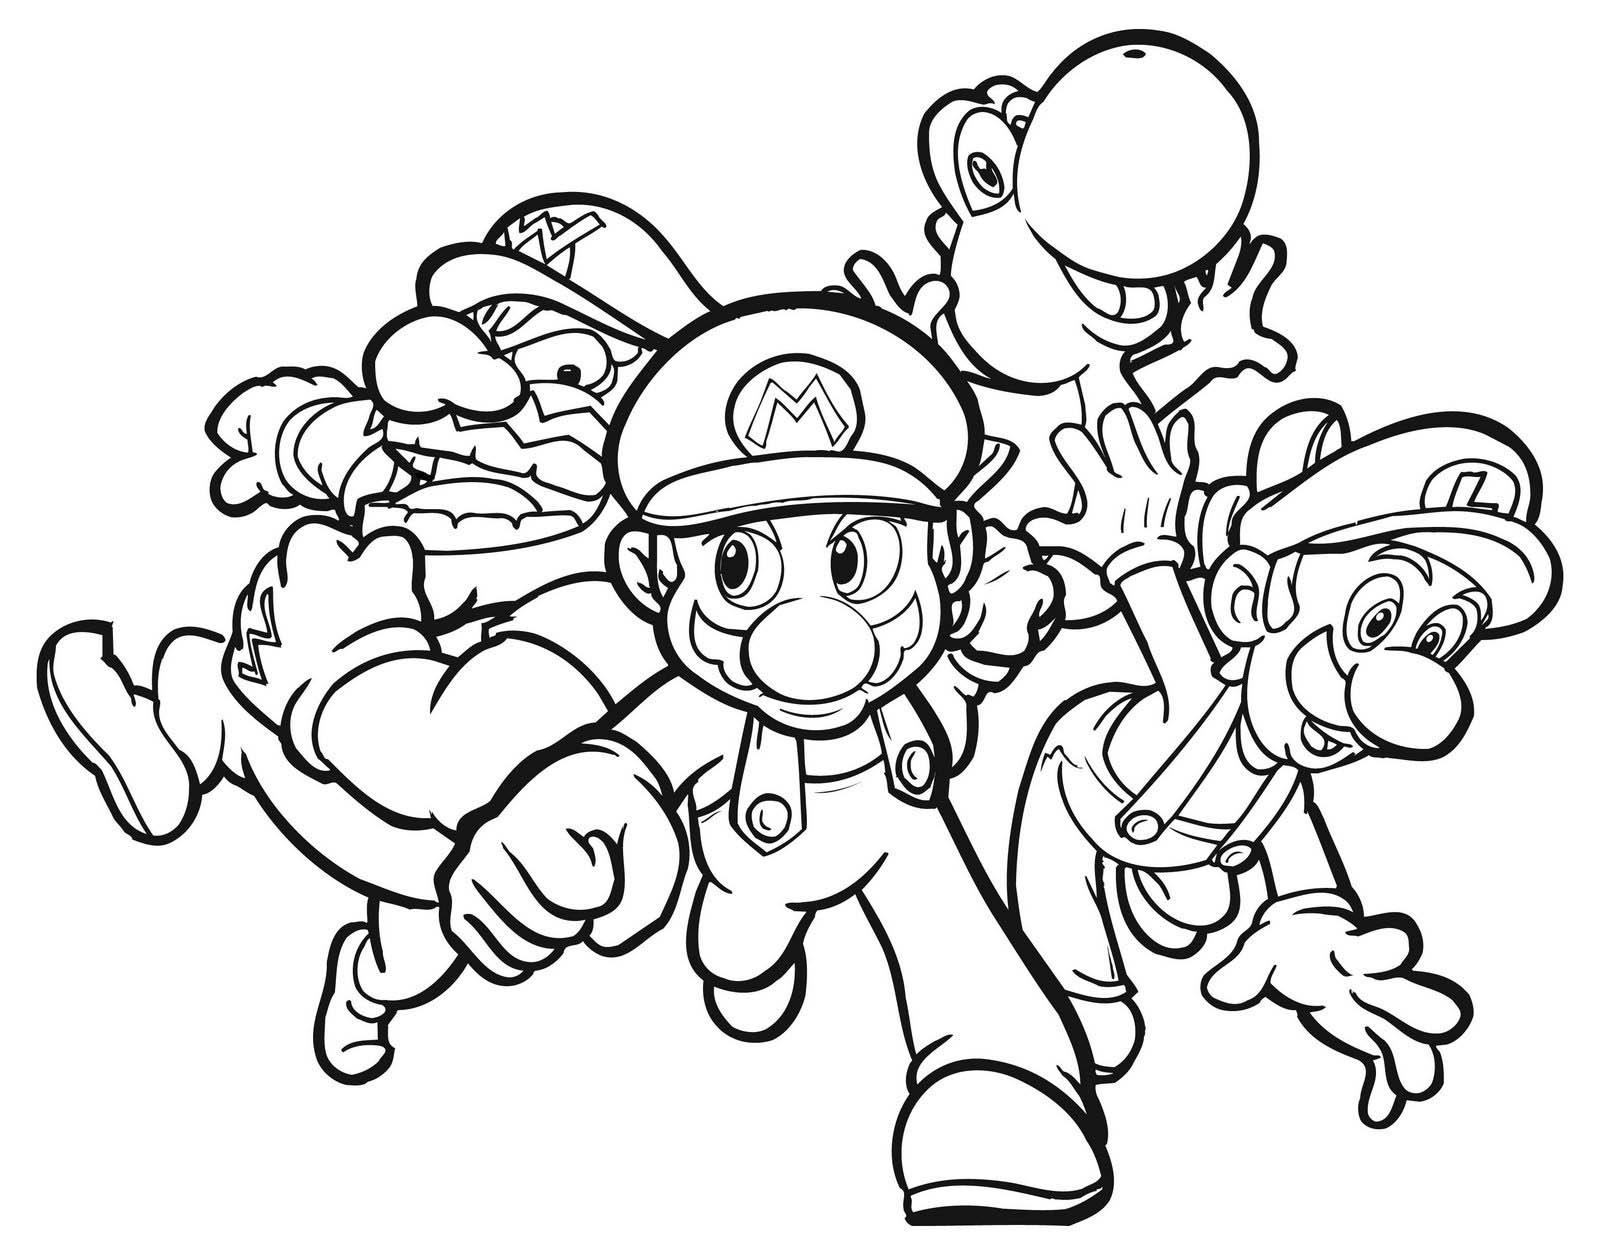 mario kart coloring mario kart coloring pages best coloring pages for kids kart mario coloring